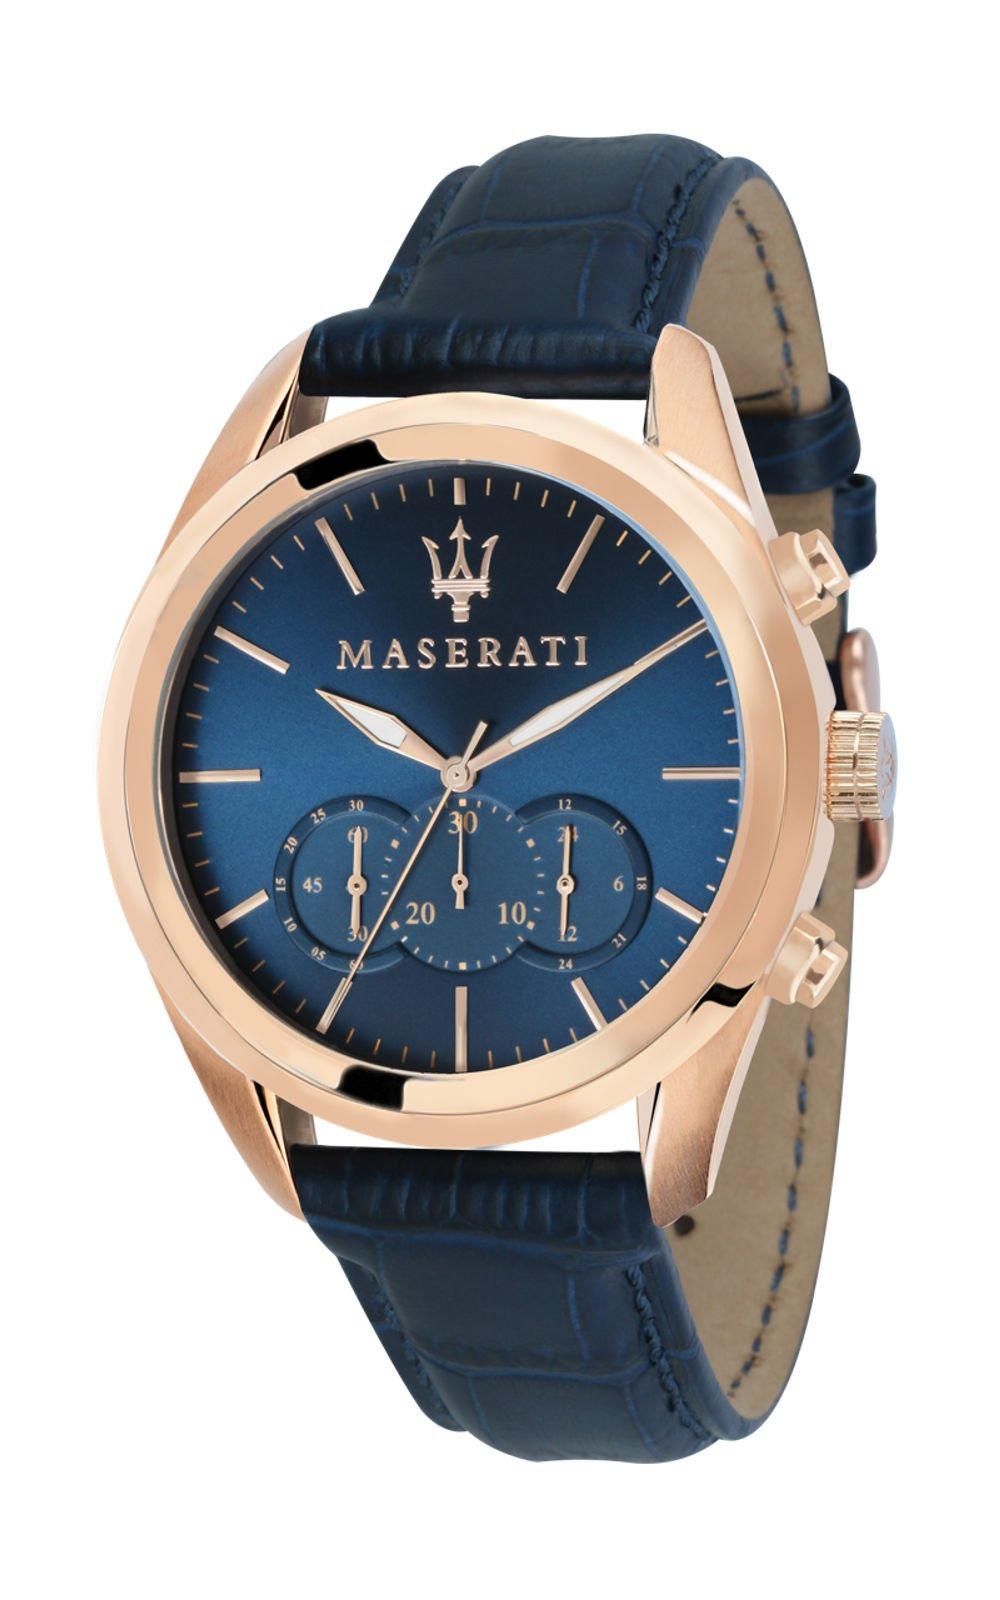 MASERATI R8871612015 Ανδρικό Ρολόι Quartz Χρονογράφος Ακριβείας